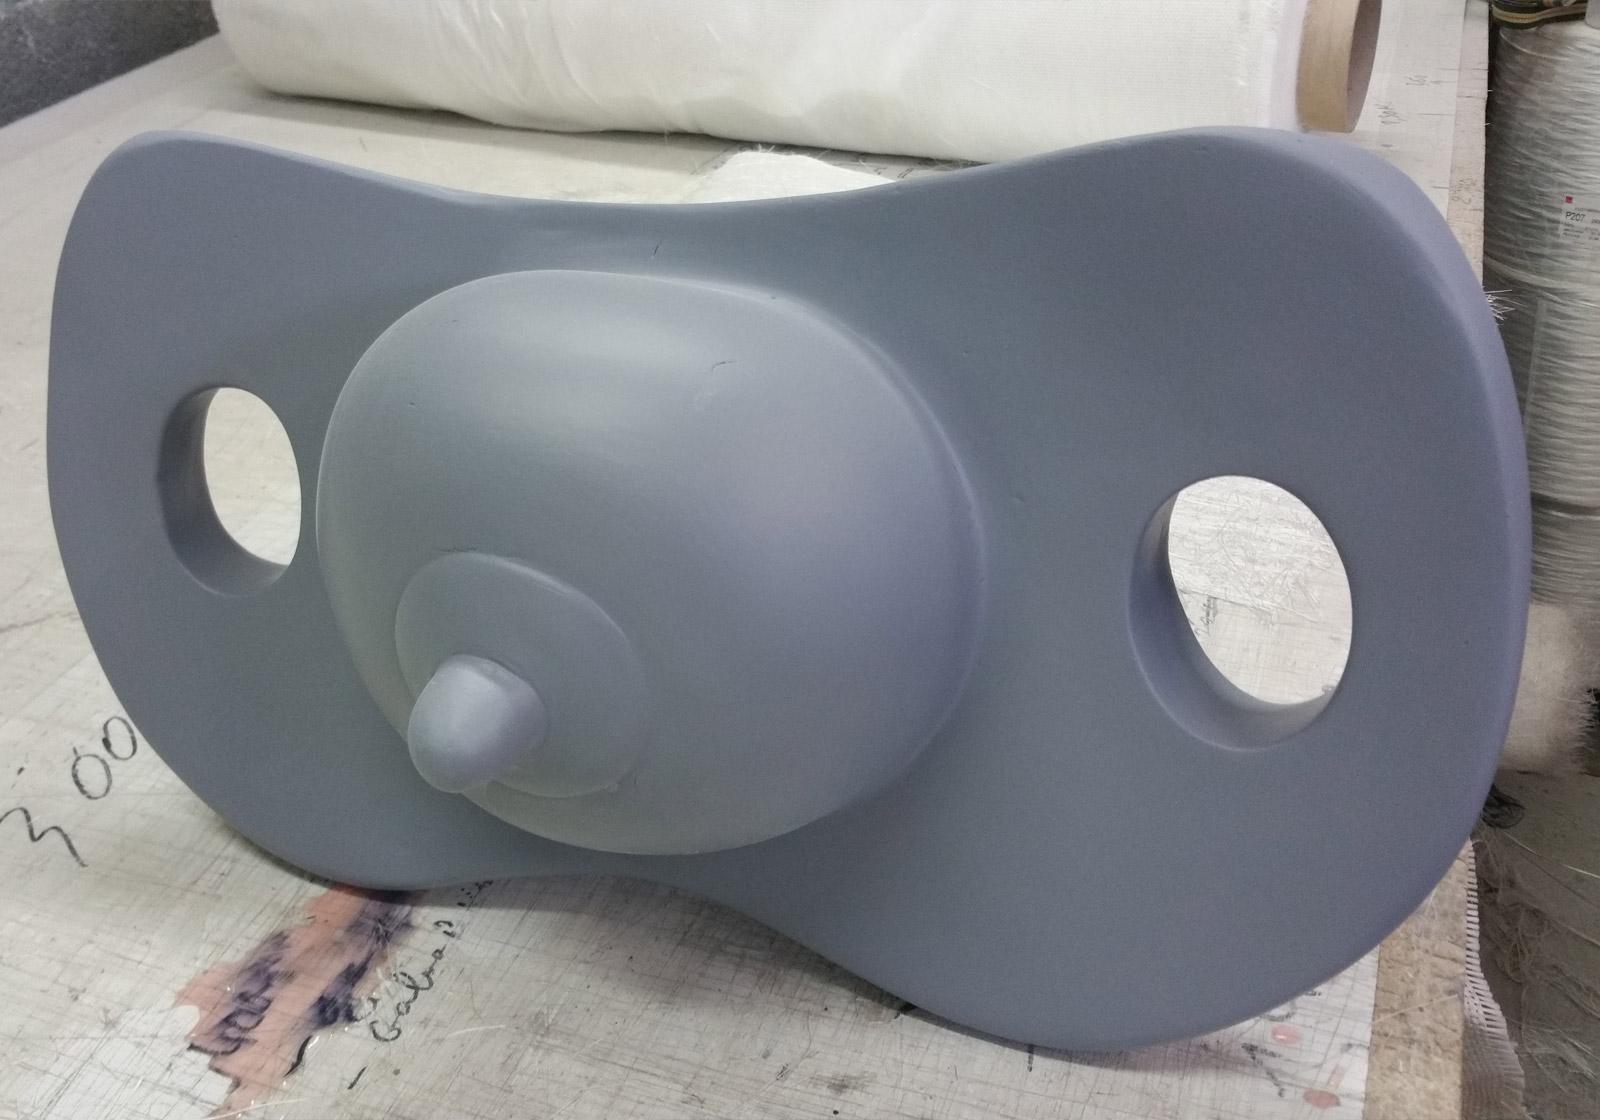 moulage-sculpture-tetine